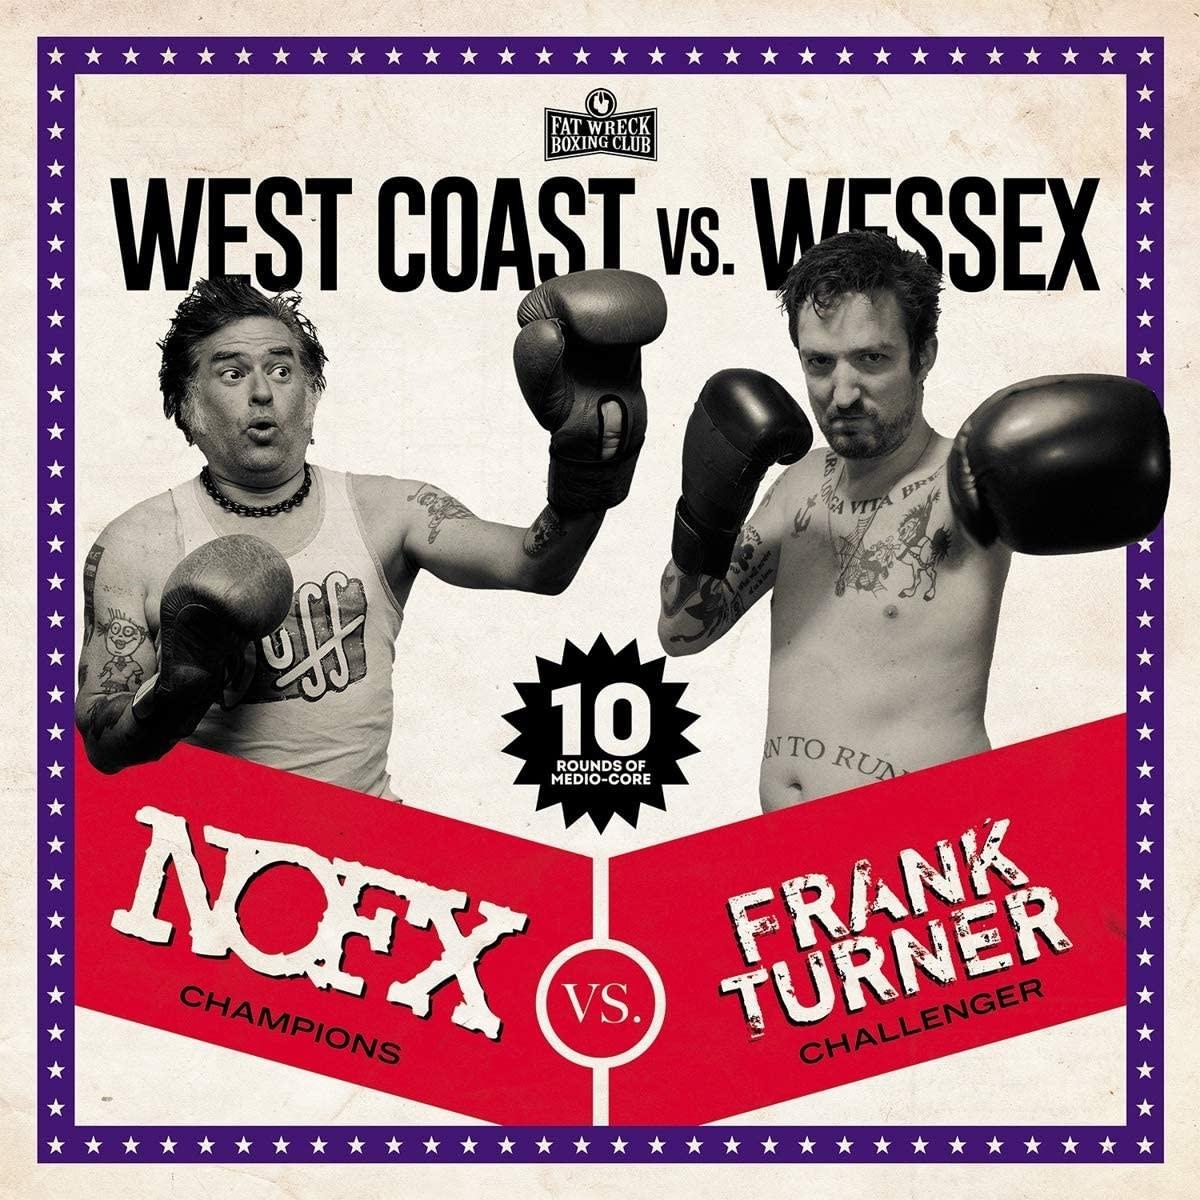 NOFX Vs. Frank Turner – West Coast Vs. Wessex